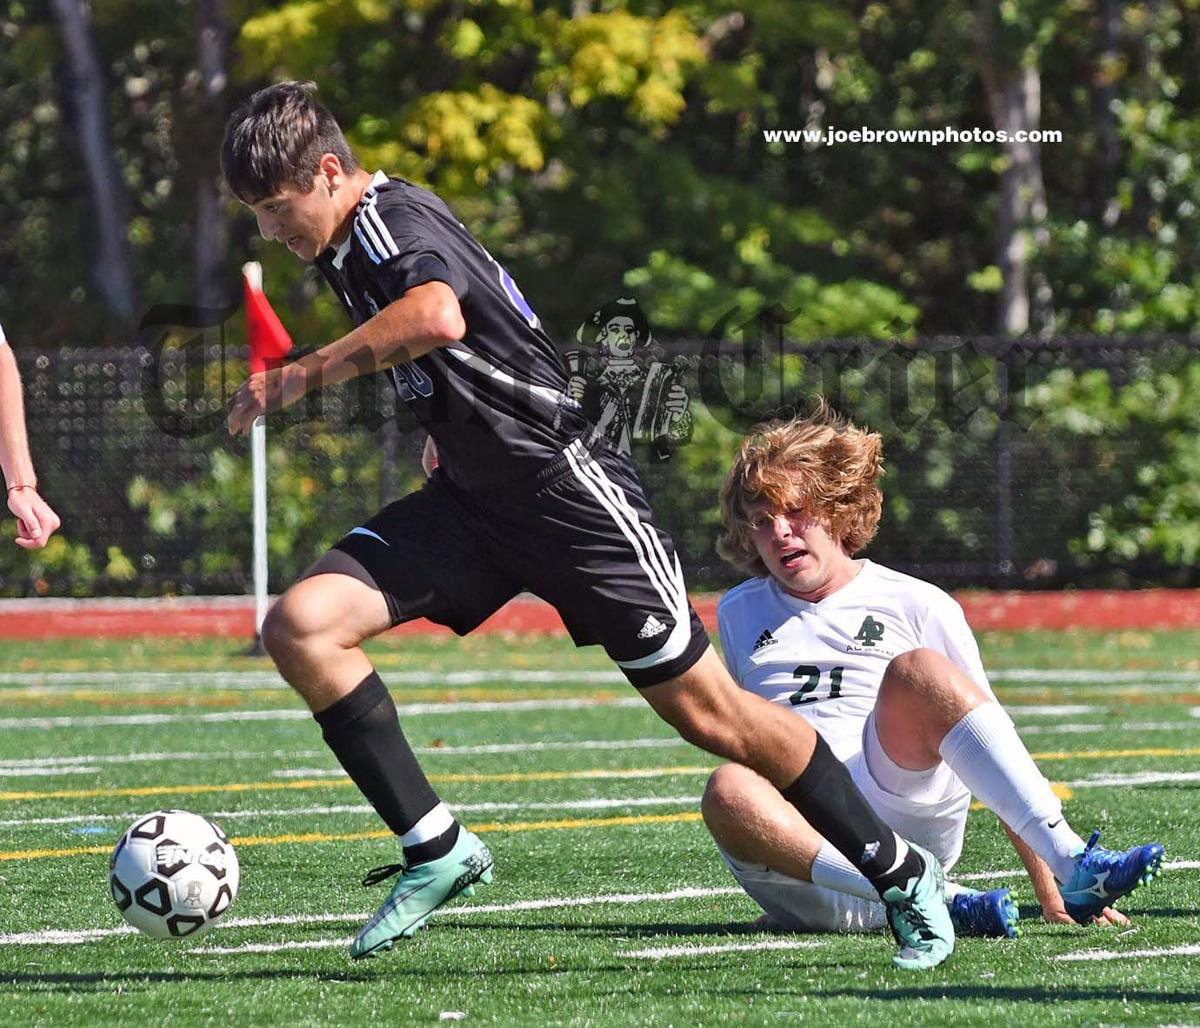 Jared Rizzo of Shawsheen Tech Boys Soccer team controls the ball